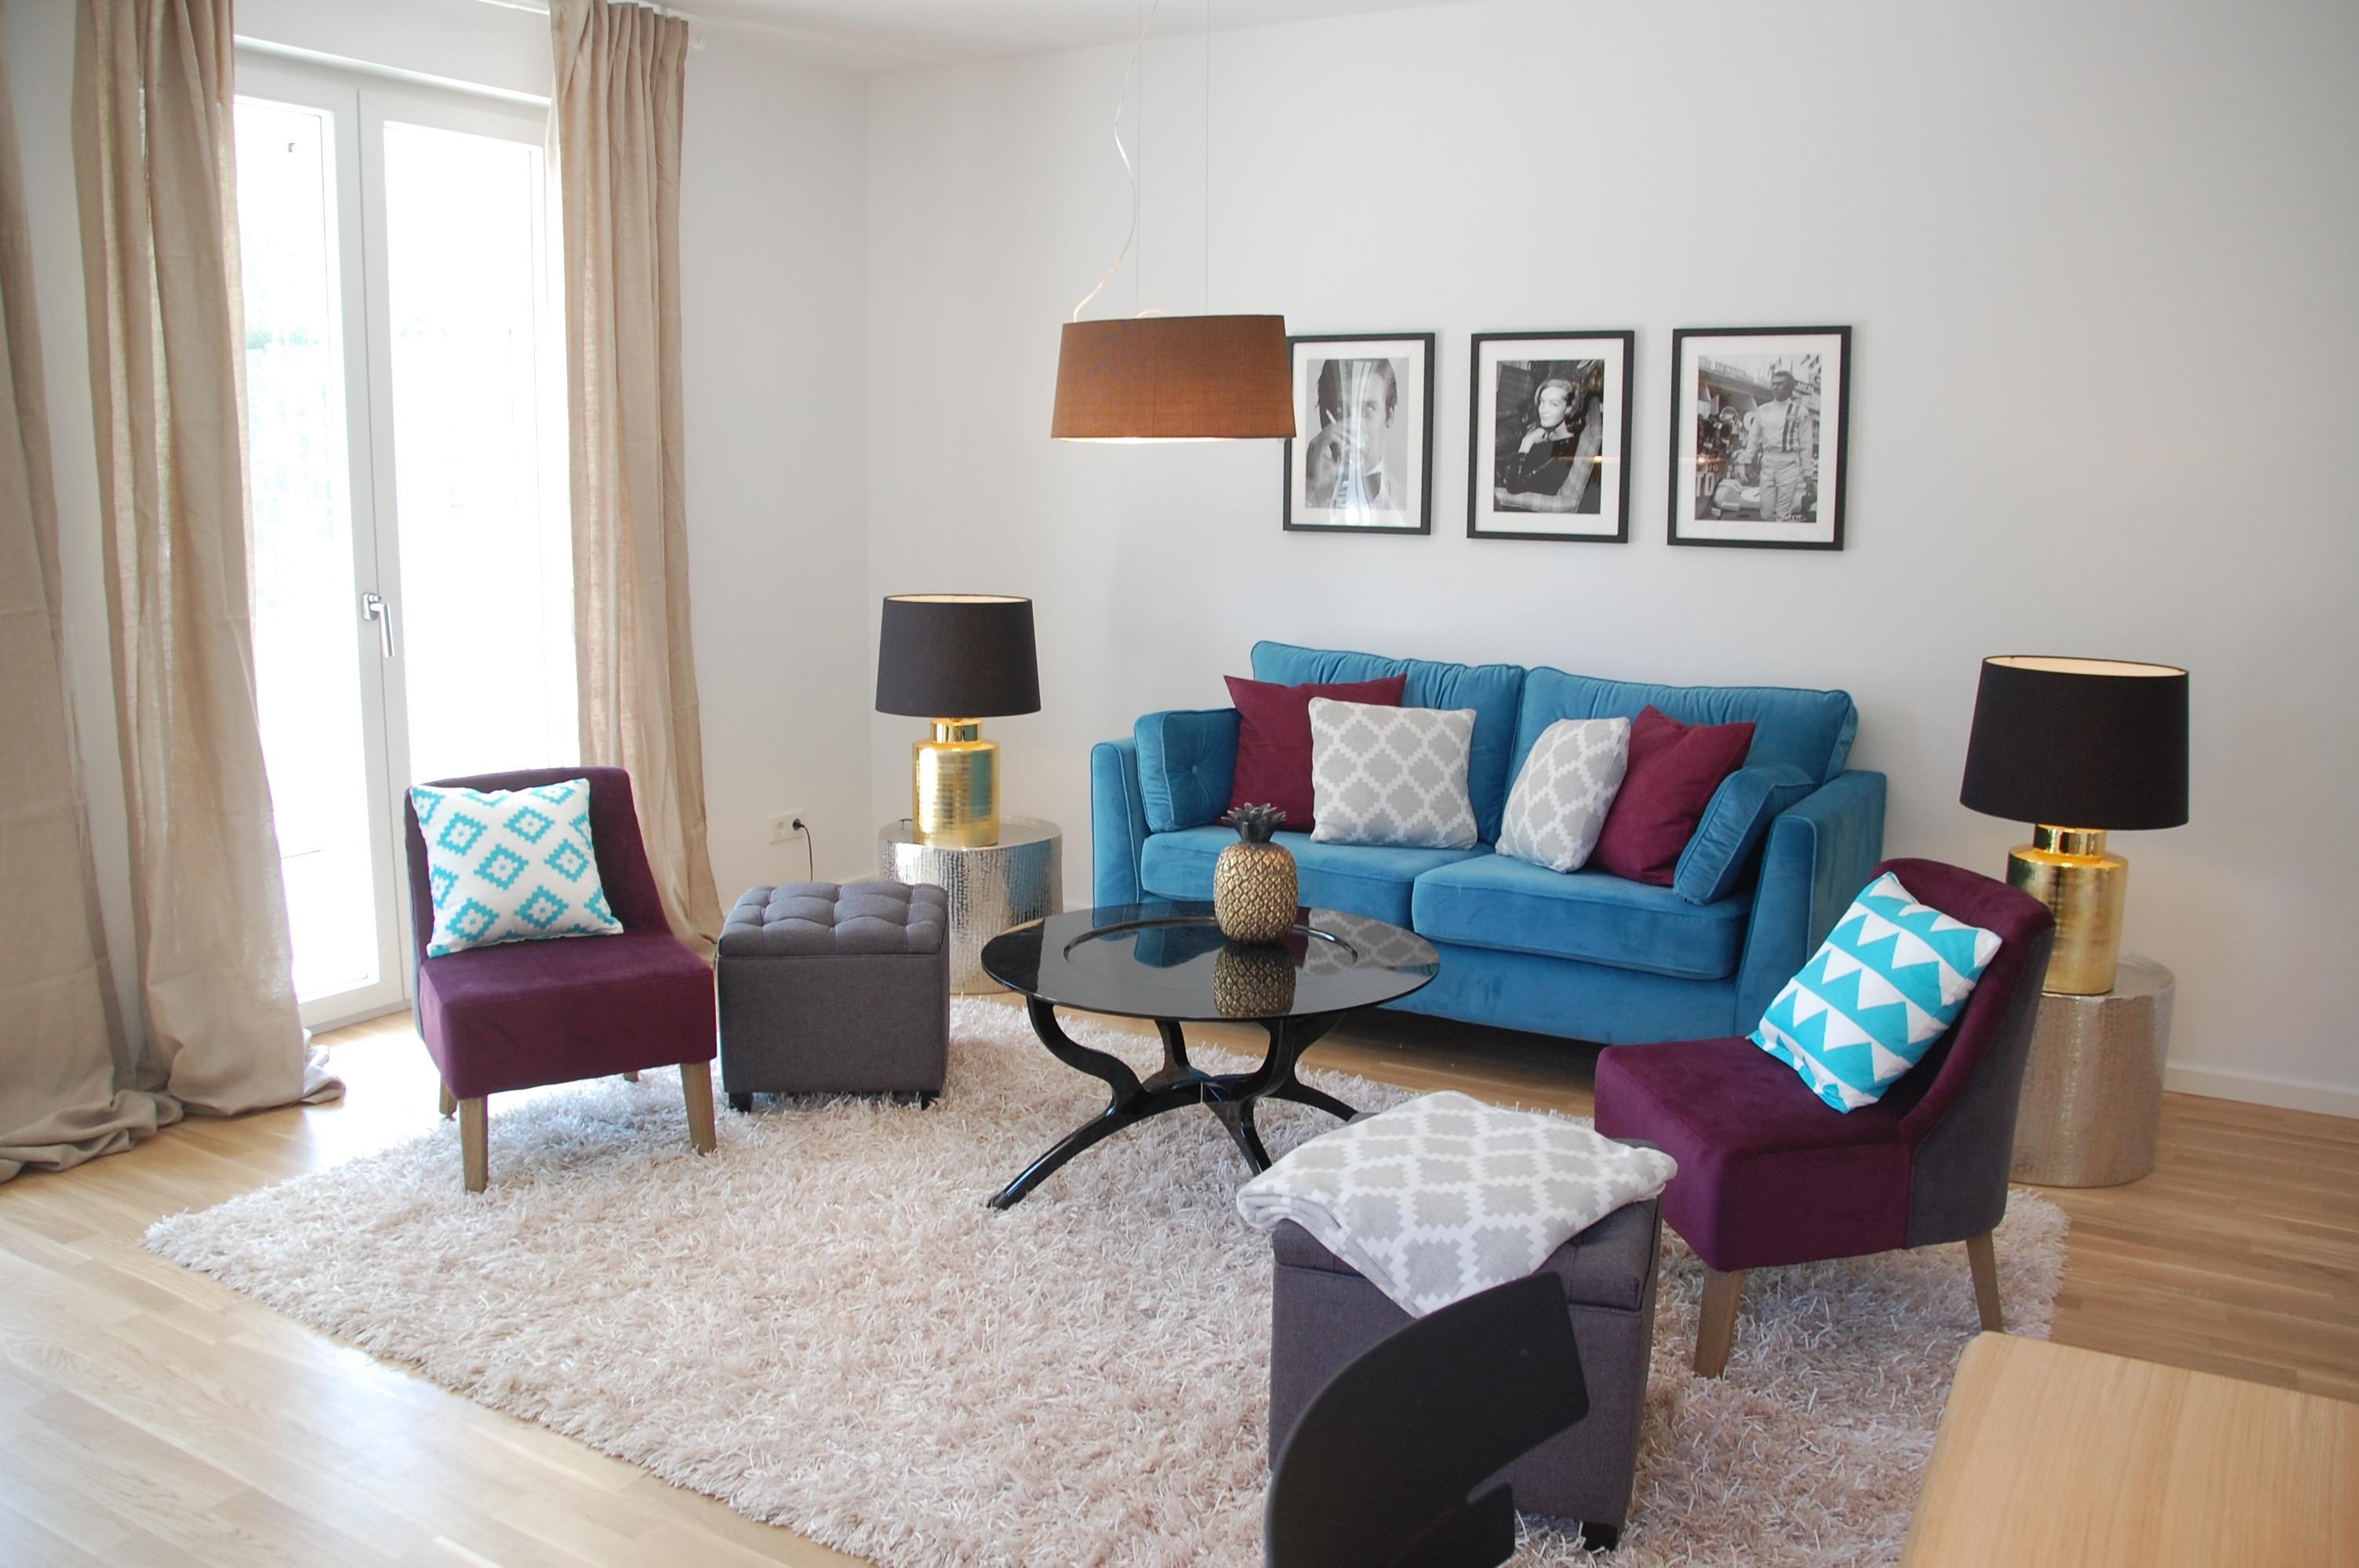 Wohnzimmer Blau und Lila #sessel #sofa ©Miracle Room...